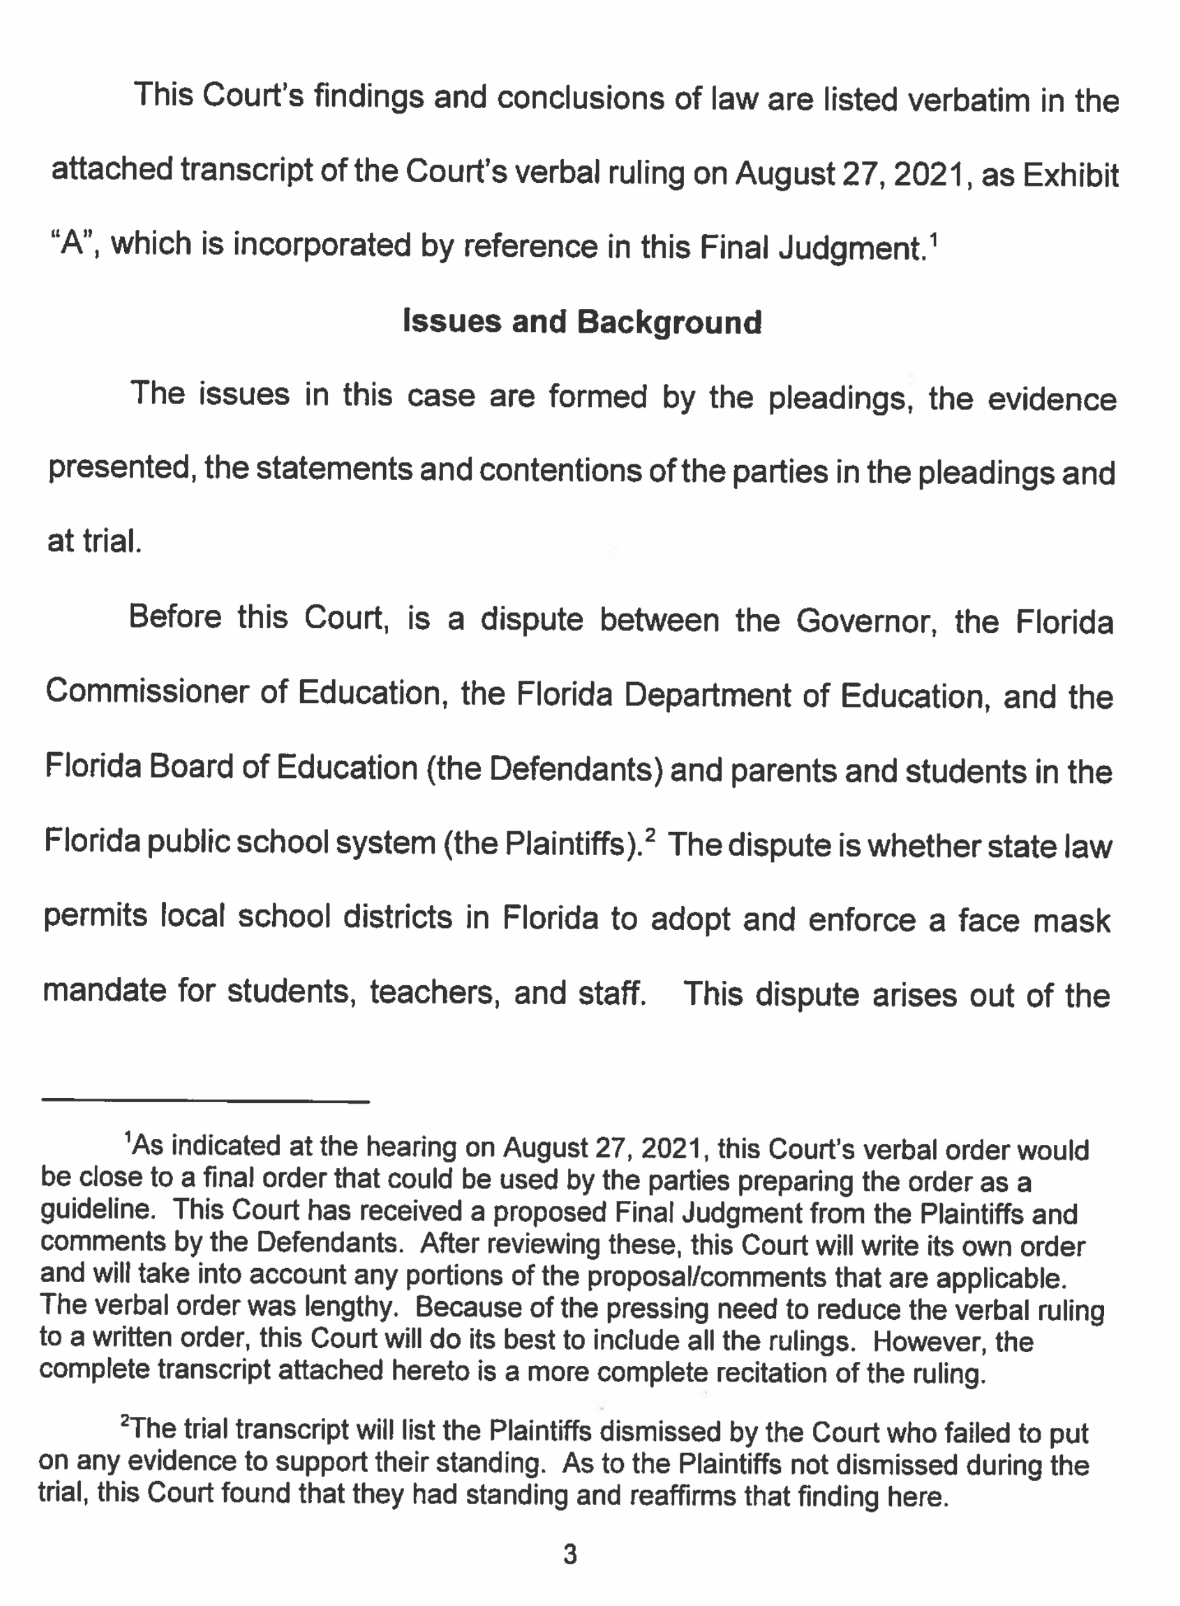 Screen-Shot-2021-09-08-at-1.12.21-PM Florida Judge Strikes Down Ron DeSantis' COVID Restrictions Coronavirus Education Featured Politics Top Stories